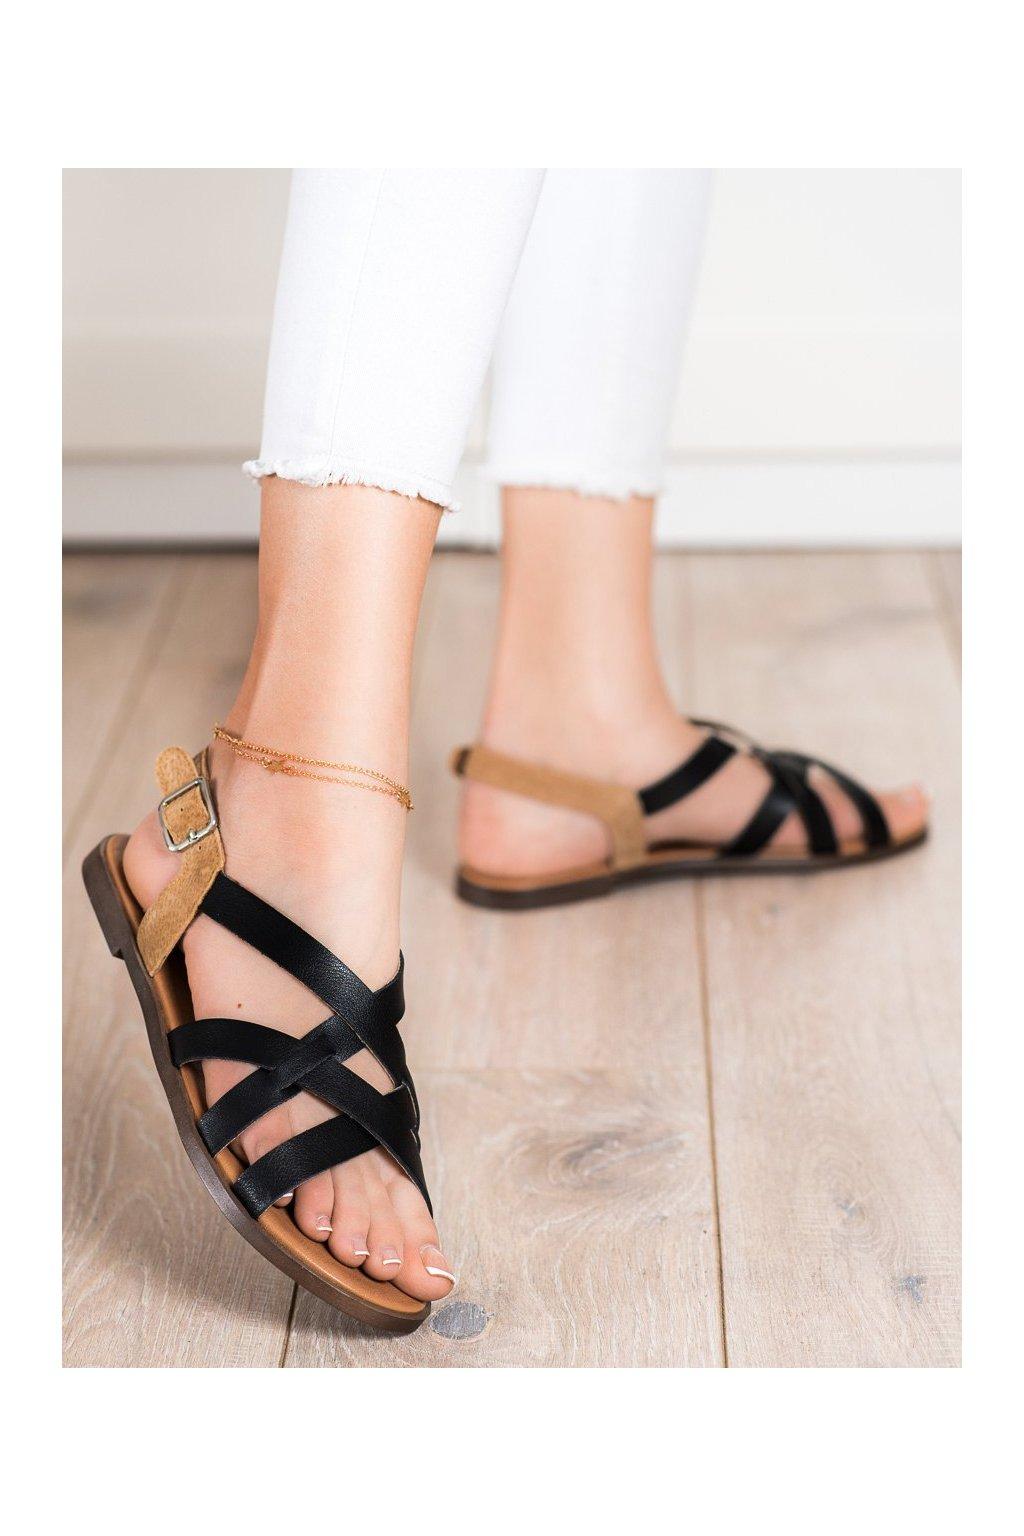 Čierne dámske sandále Sergio leone kod SK062B